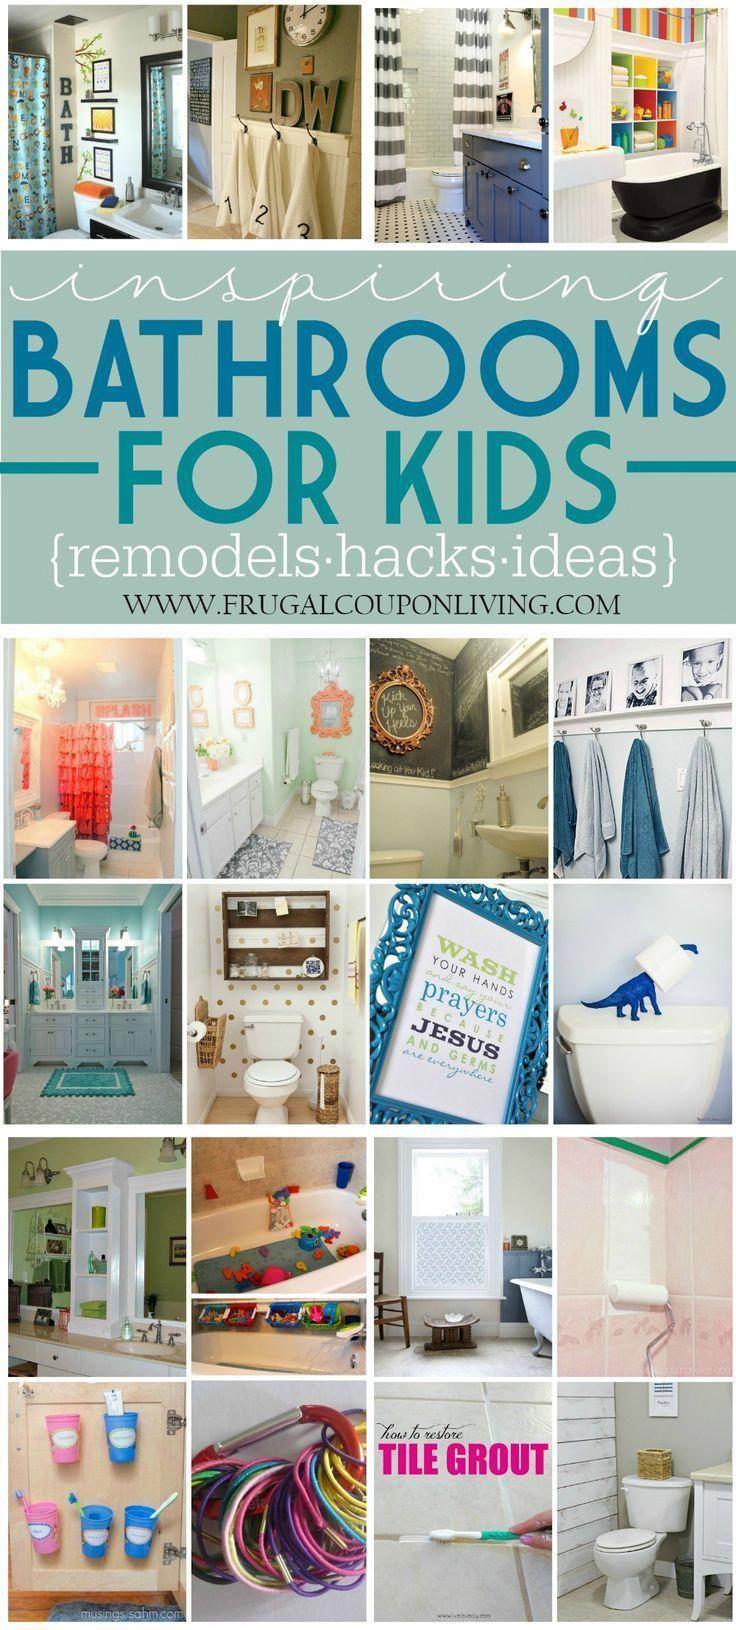 Inspiring Kids Bathrooms Remodels And Hacks Bathroom Kids Girl Bathrooms Kid Bathroom Decor Baby boy bathroom decor